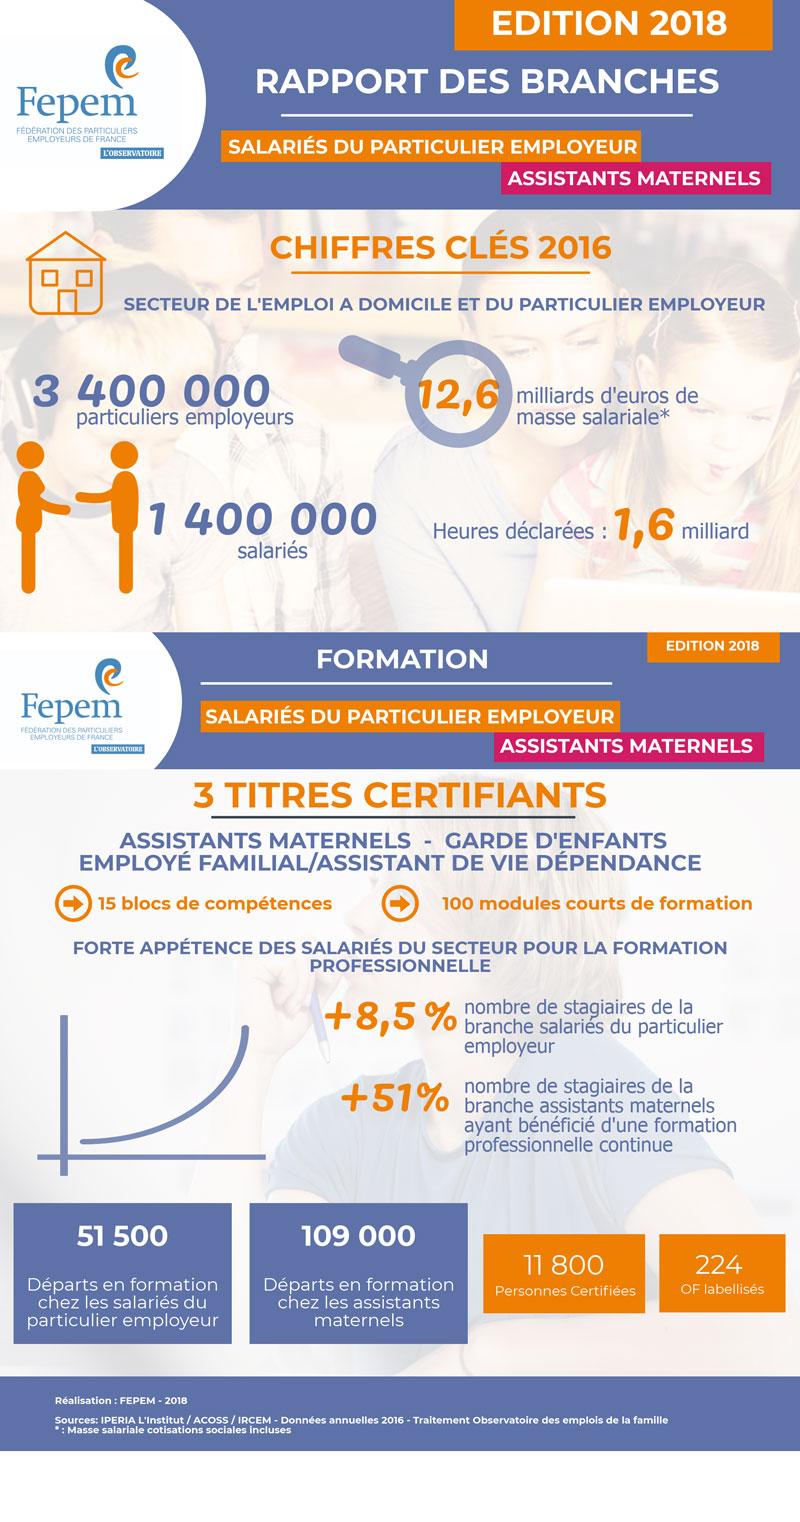 Infographie-rapport-des-branches Fepem